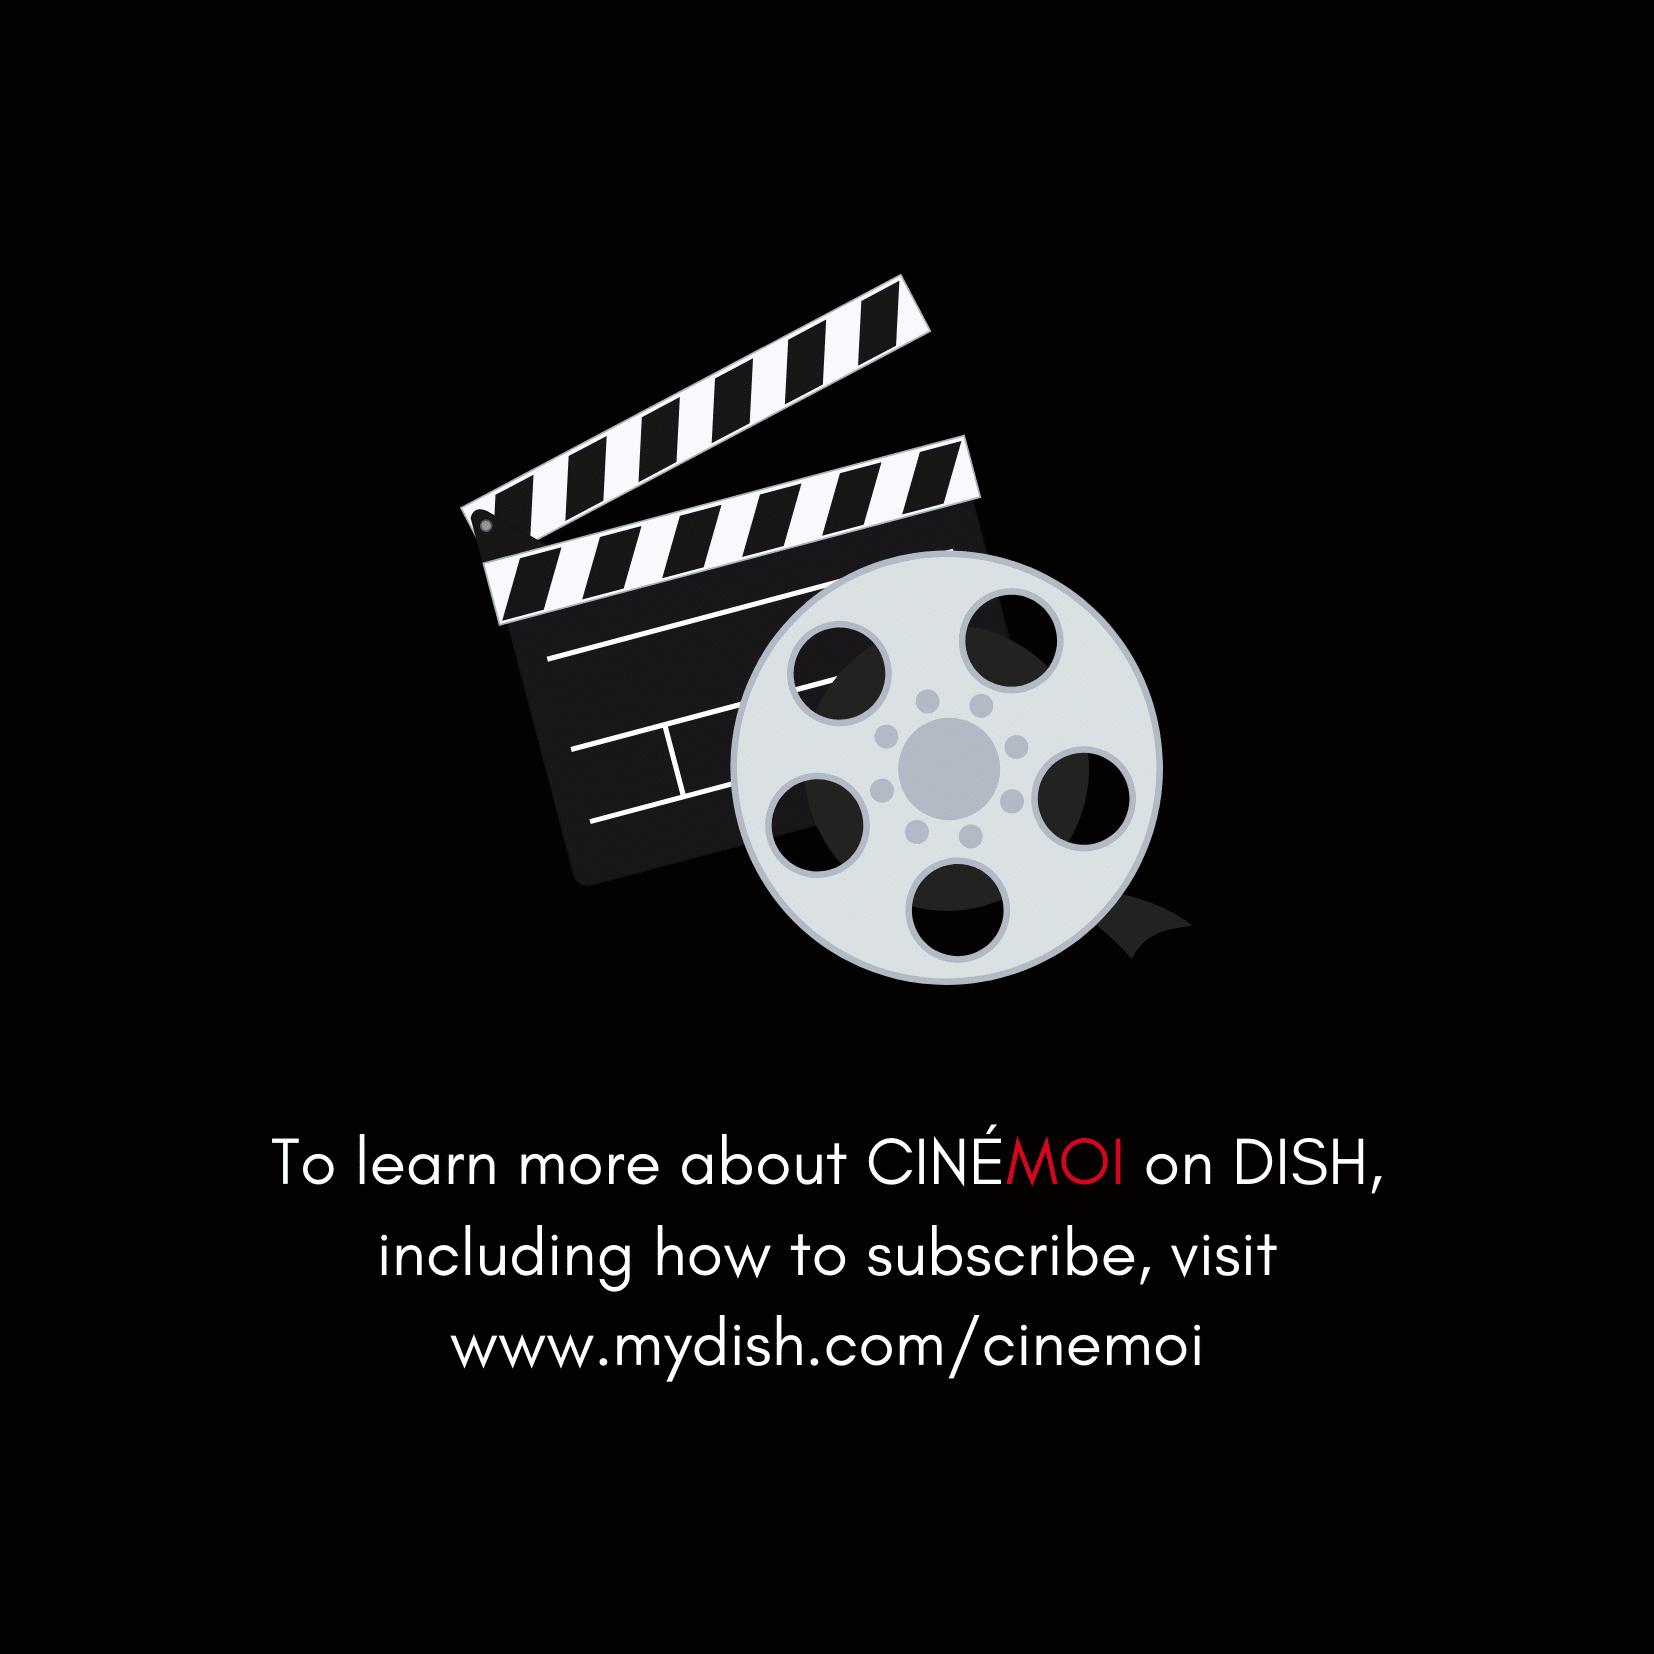 Cinémoi is NOW Available on DISH! 3